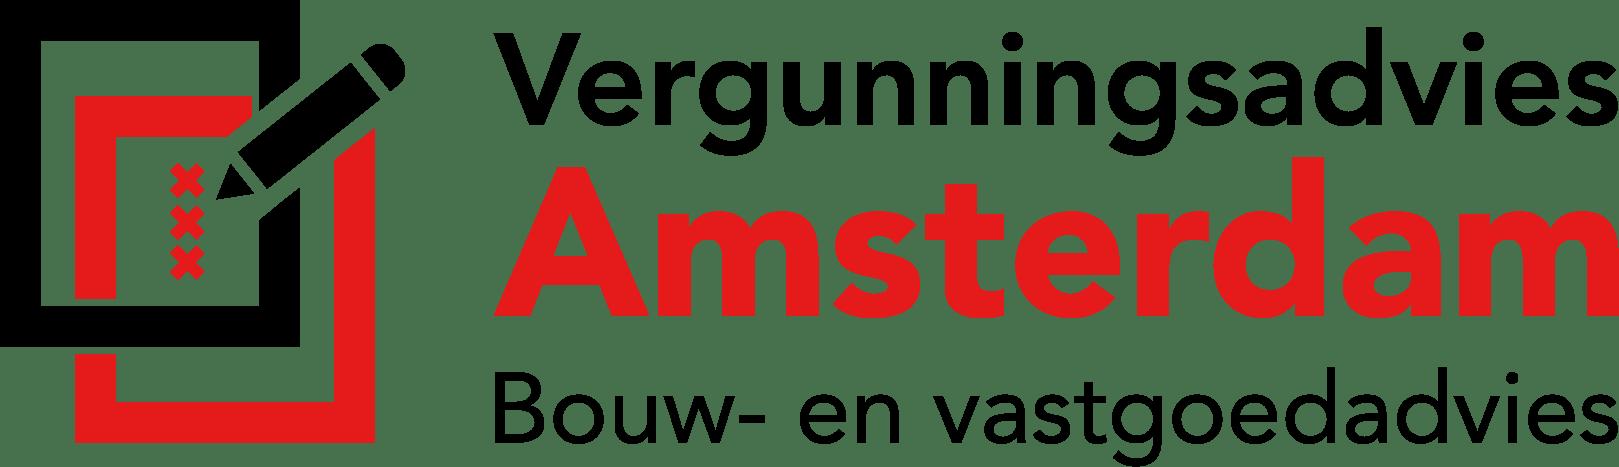 Vergunningsadvies Amsterdam